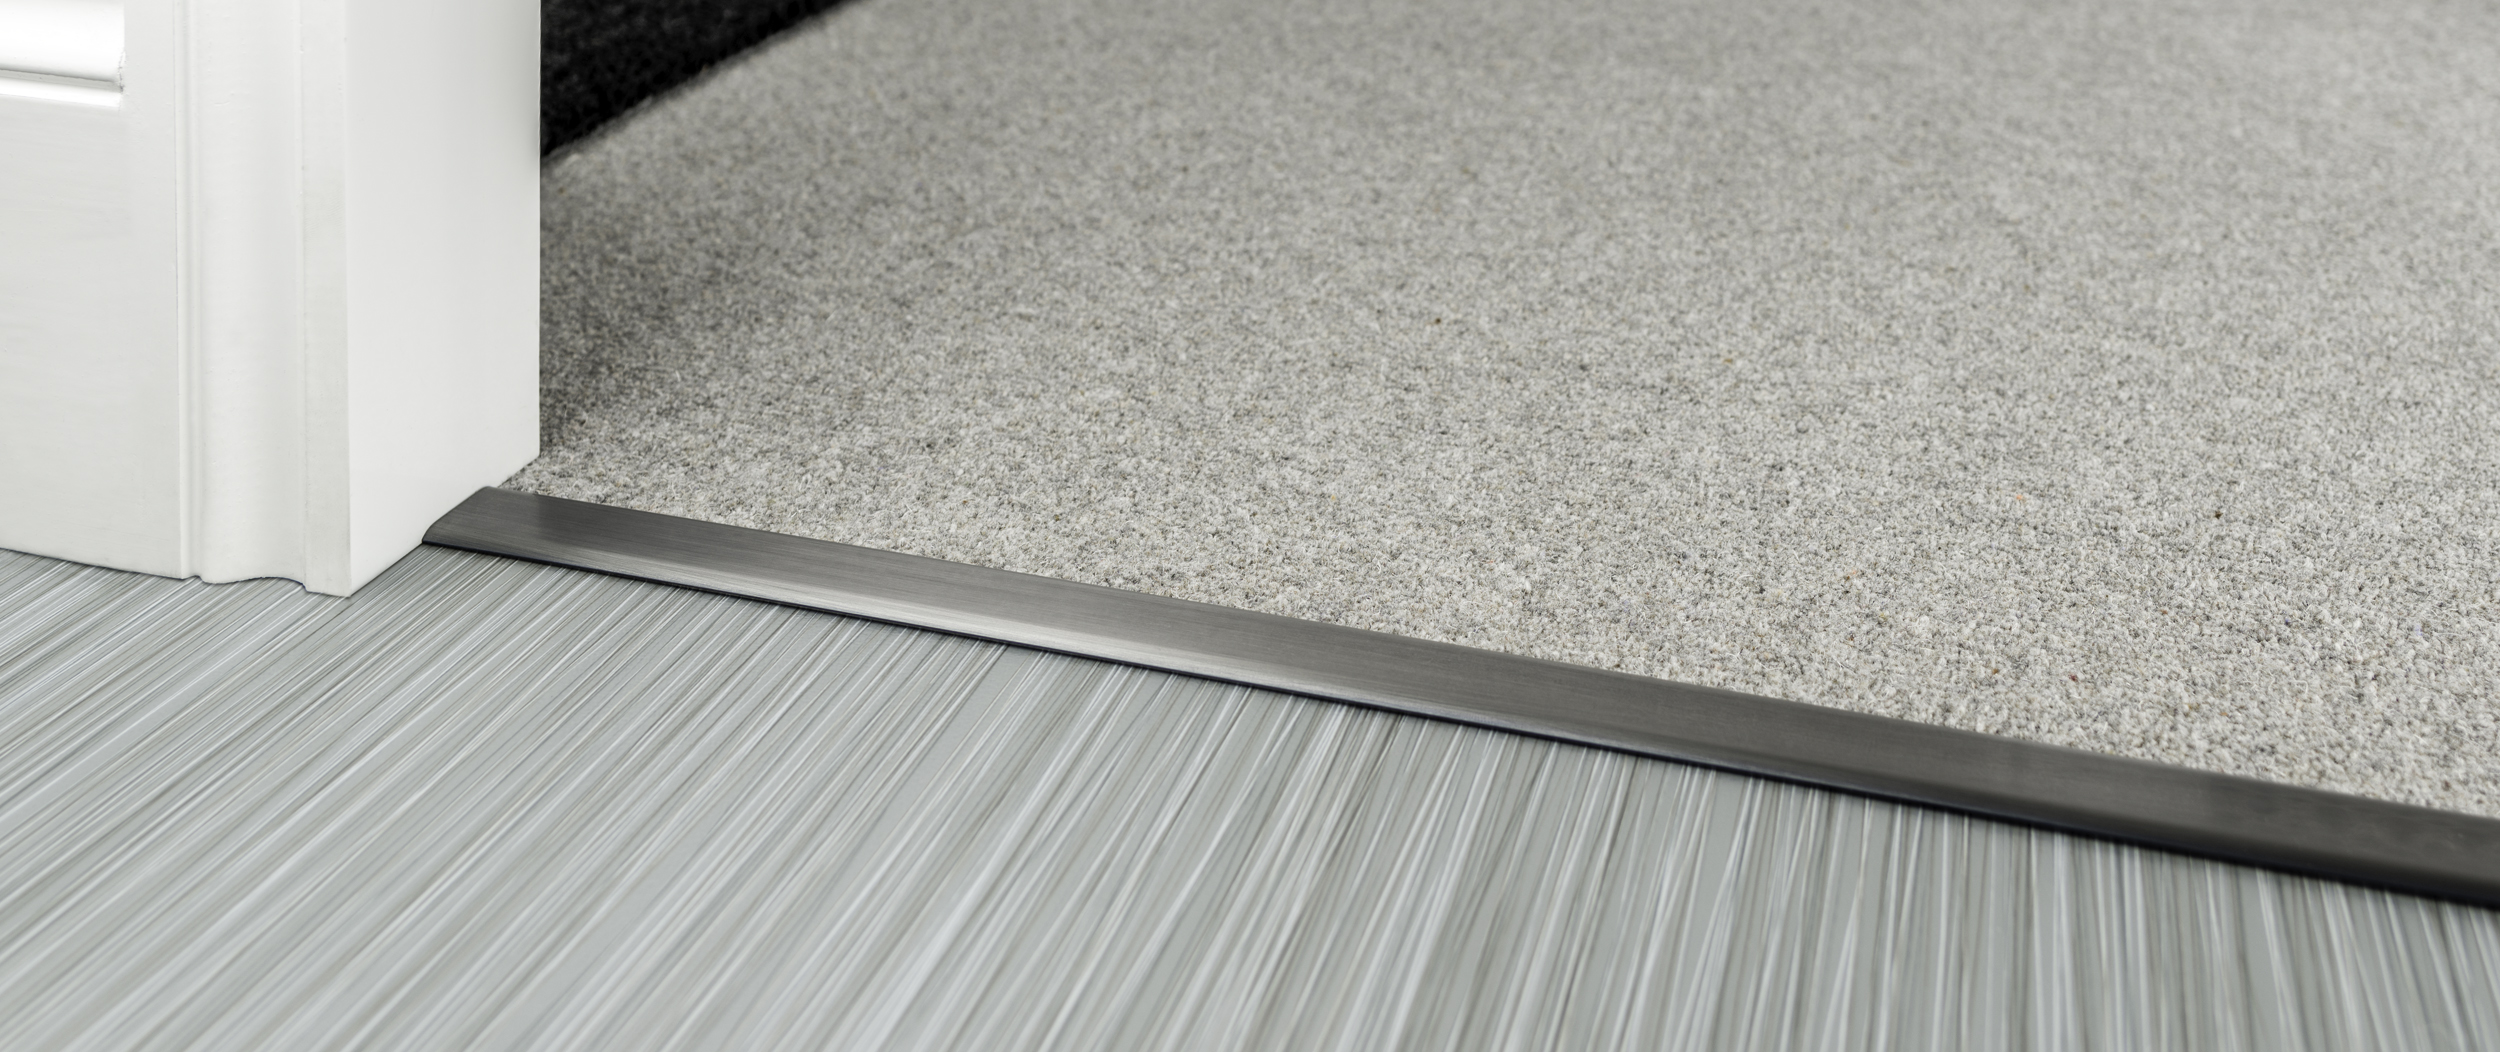 Stairrods Uk Premier Trims For Carpet